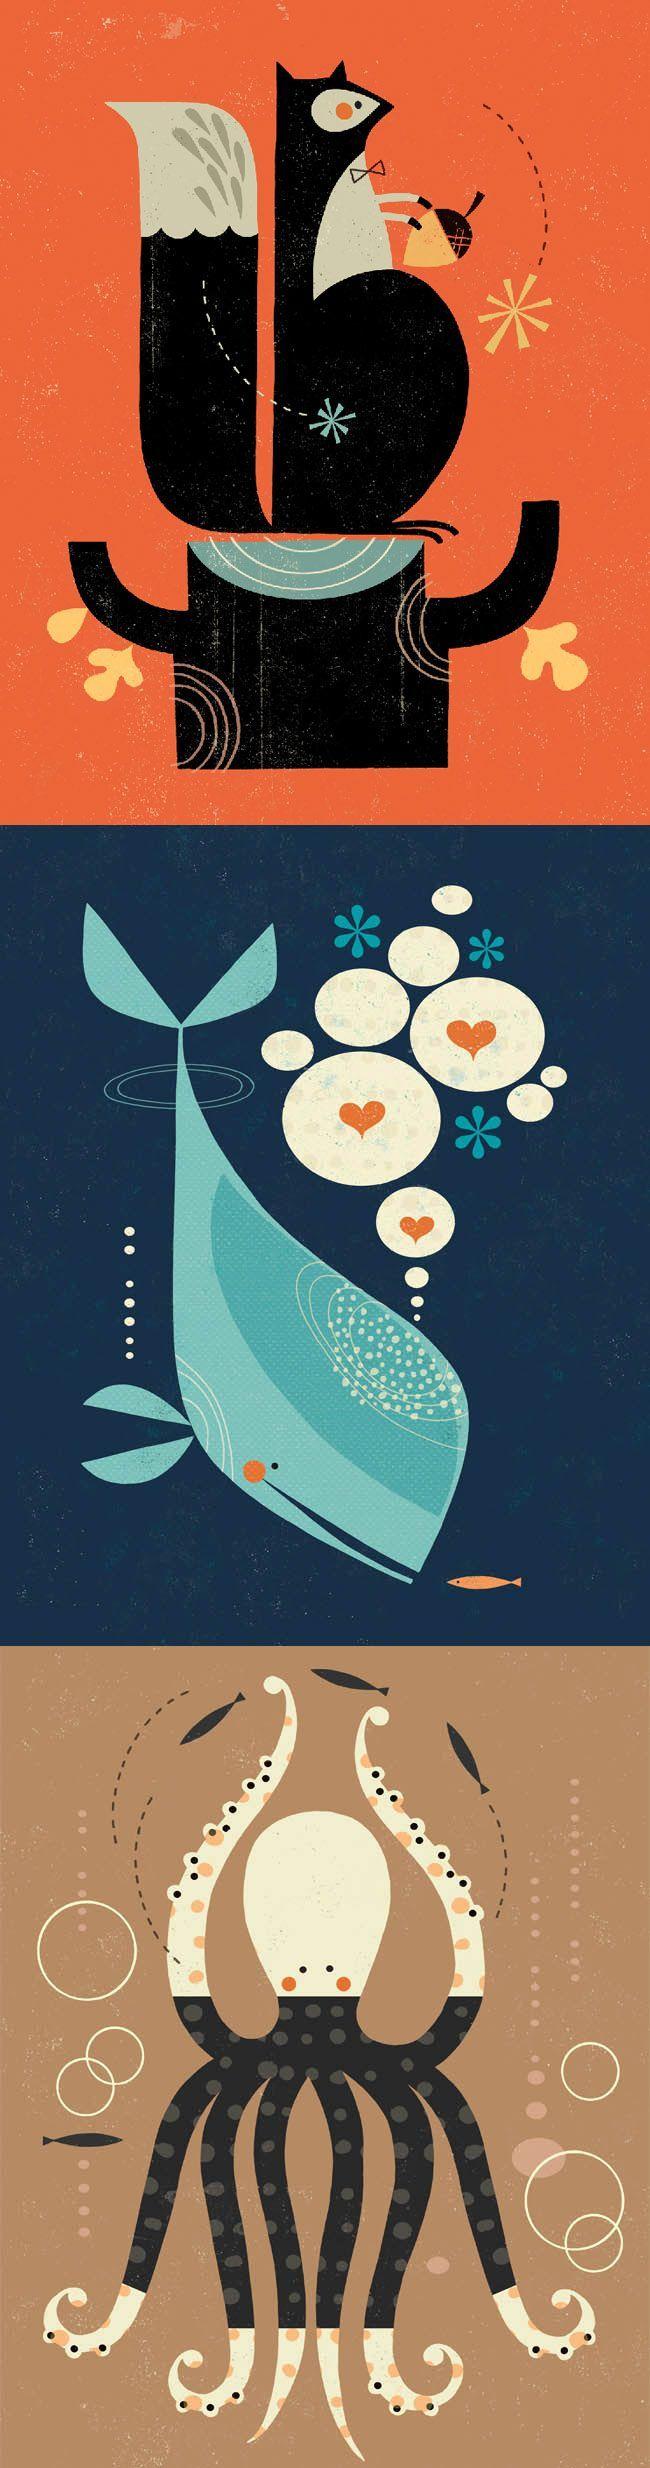 Tracy Walker Illustration - JOURNAL: